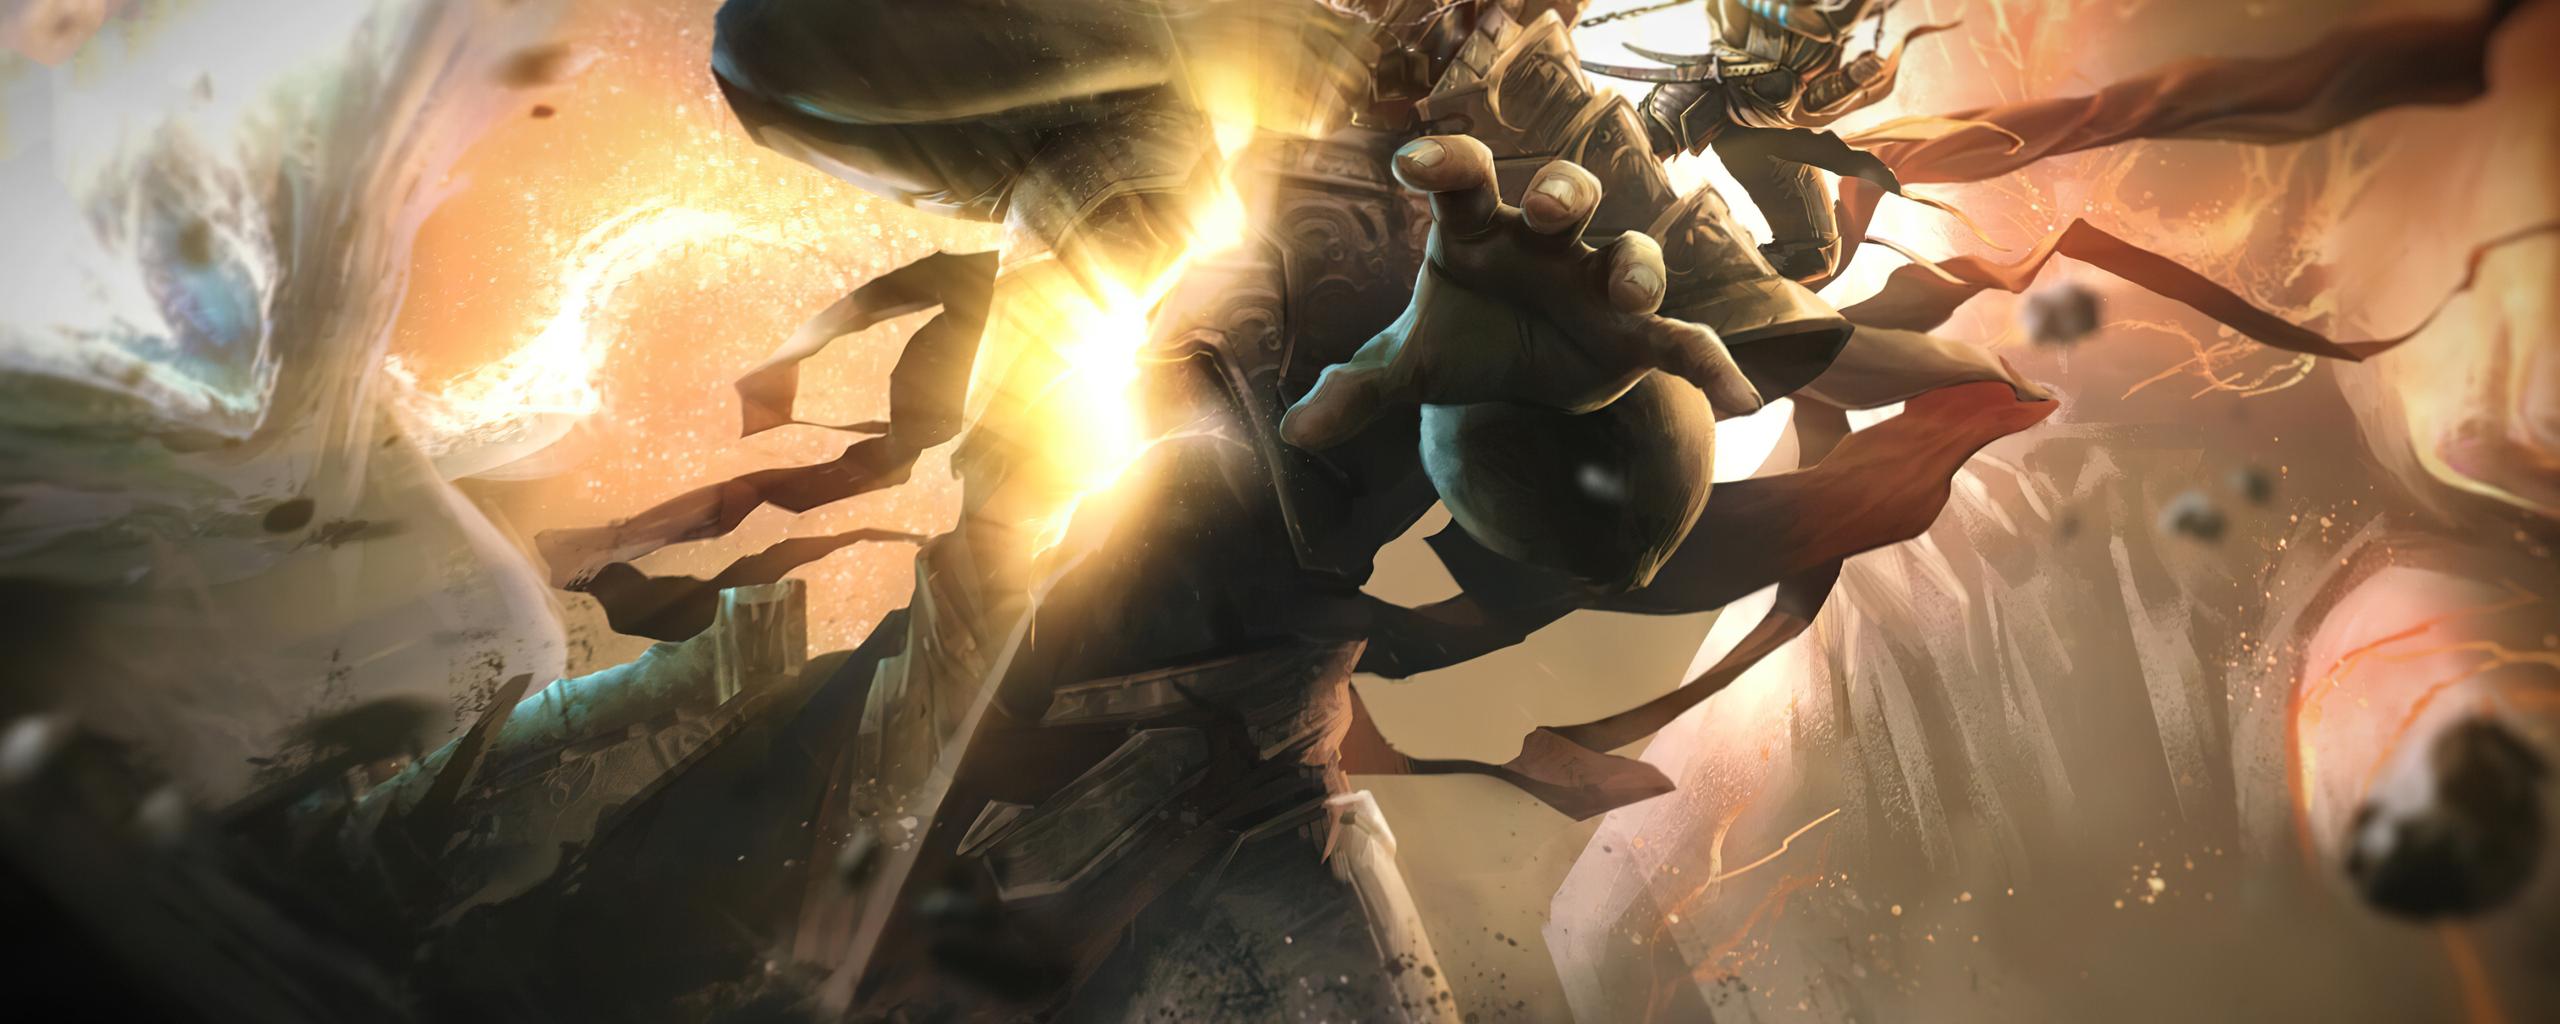 2560x1024 Mortal Kombat 11 Game Graphic Art 4k 2560x1024 ...